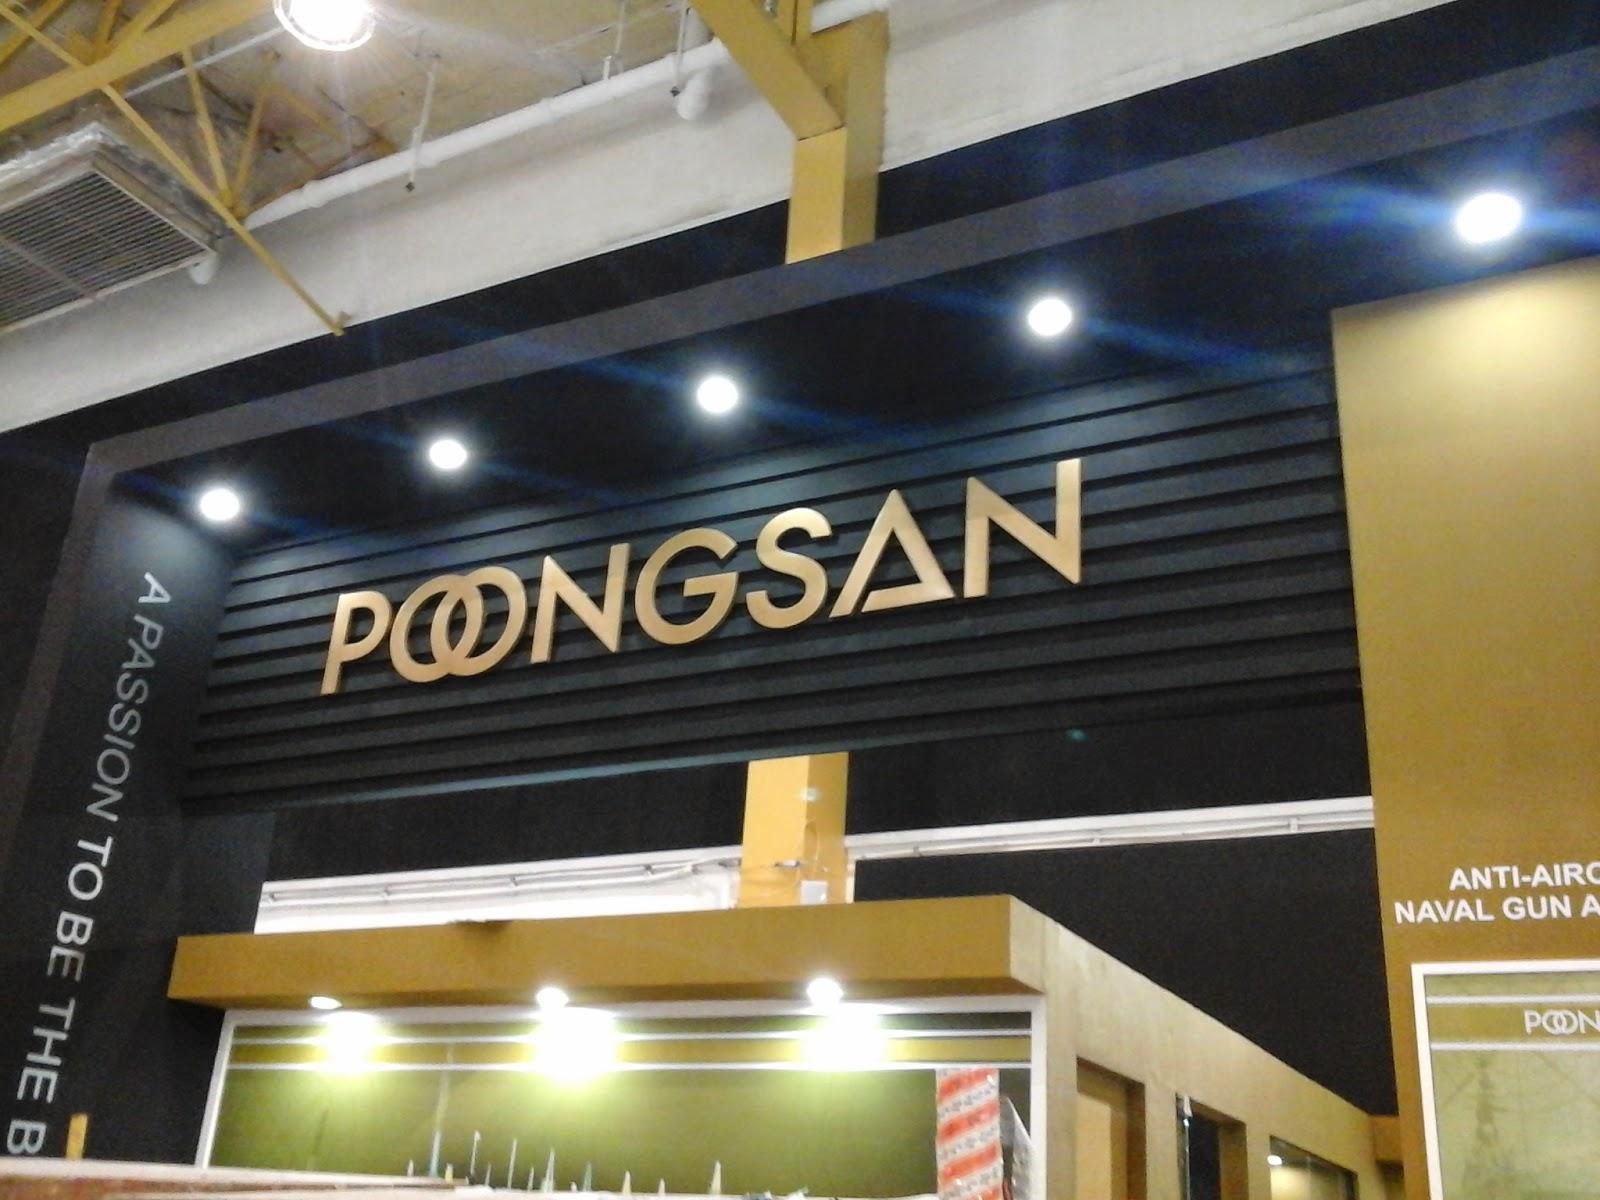 Poongsan ADAS 2014 Trade Show Booth Fascia